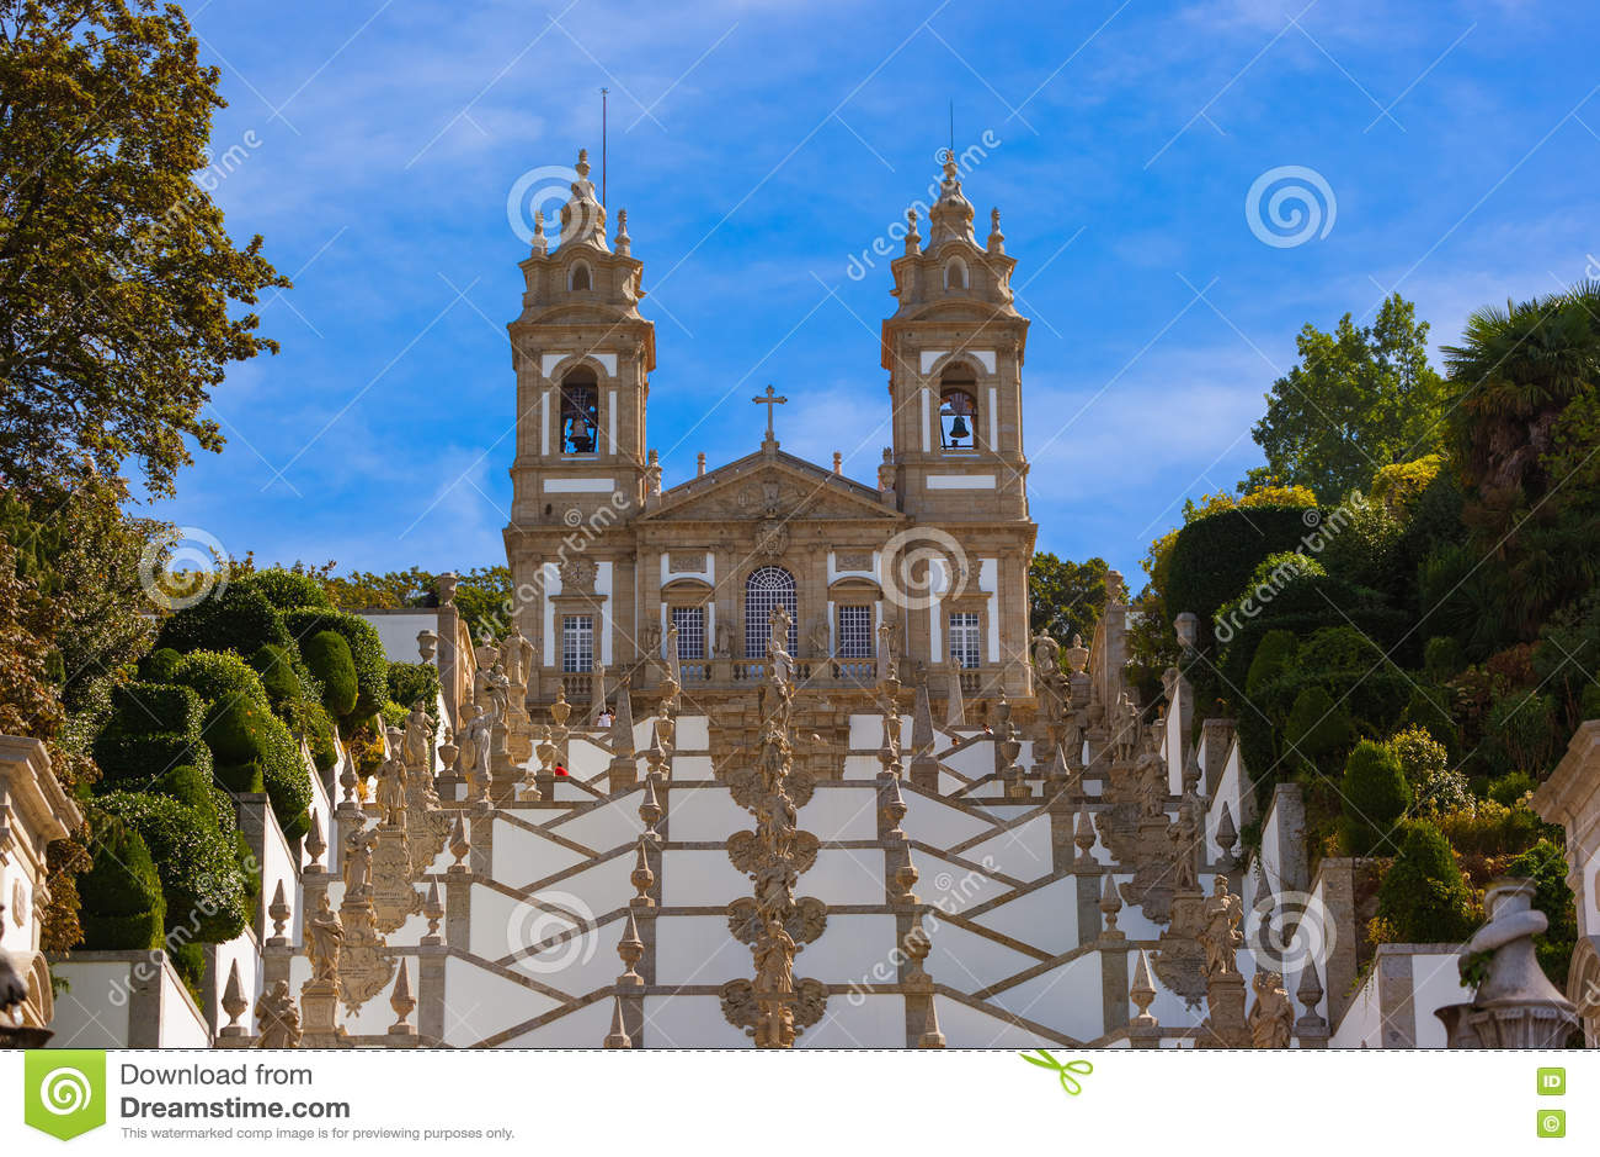 De kerk van Bomjesus in Braga - Portugal